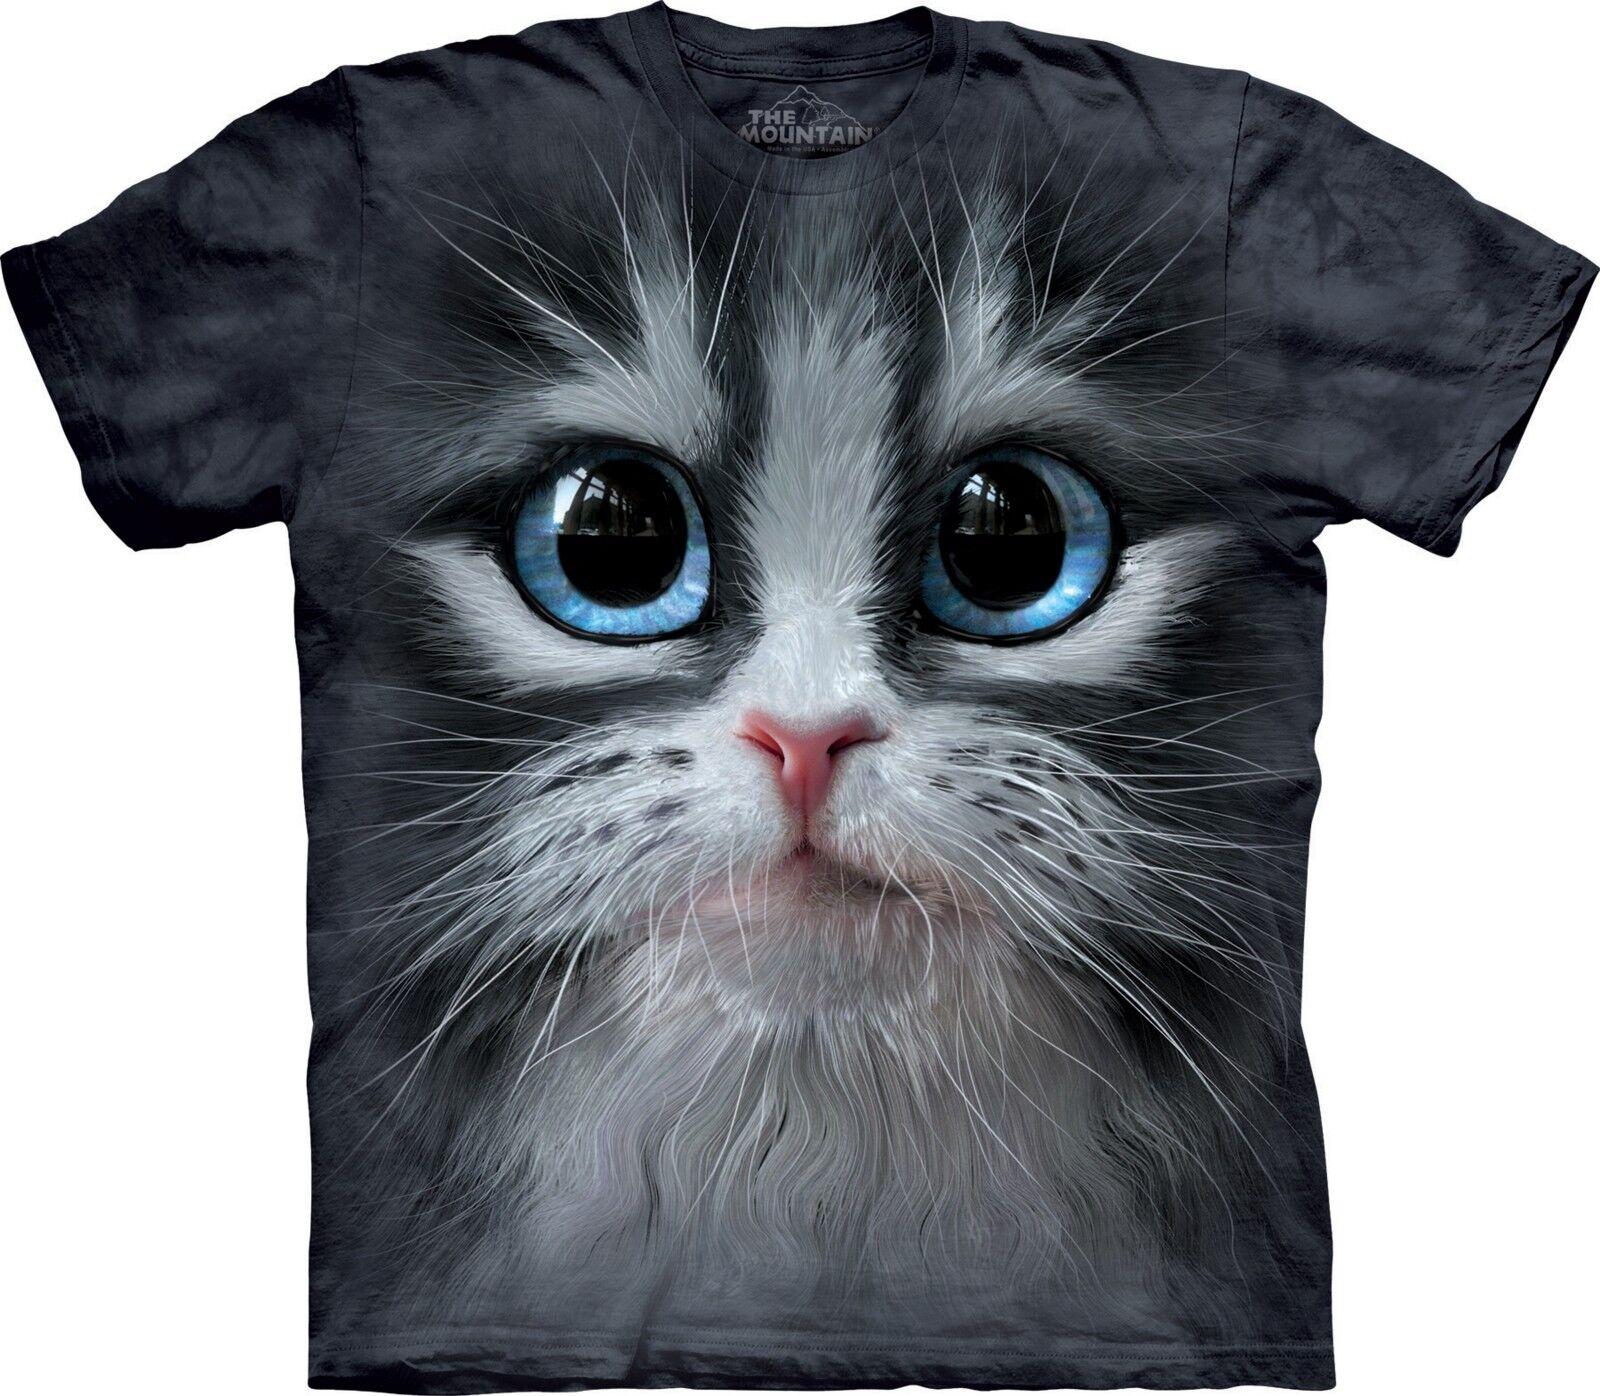 Cutie Pie Kitten Cat T Shirt Adult Unisex The Mountain